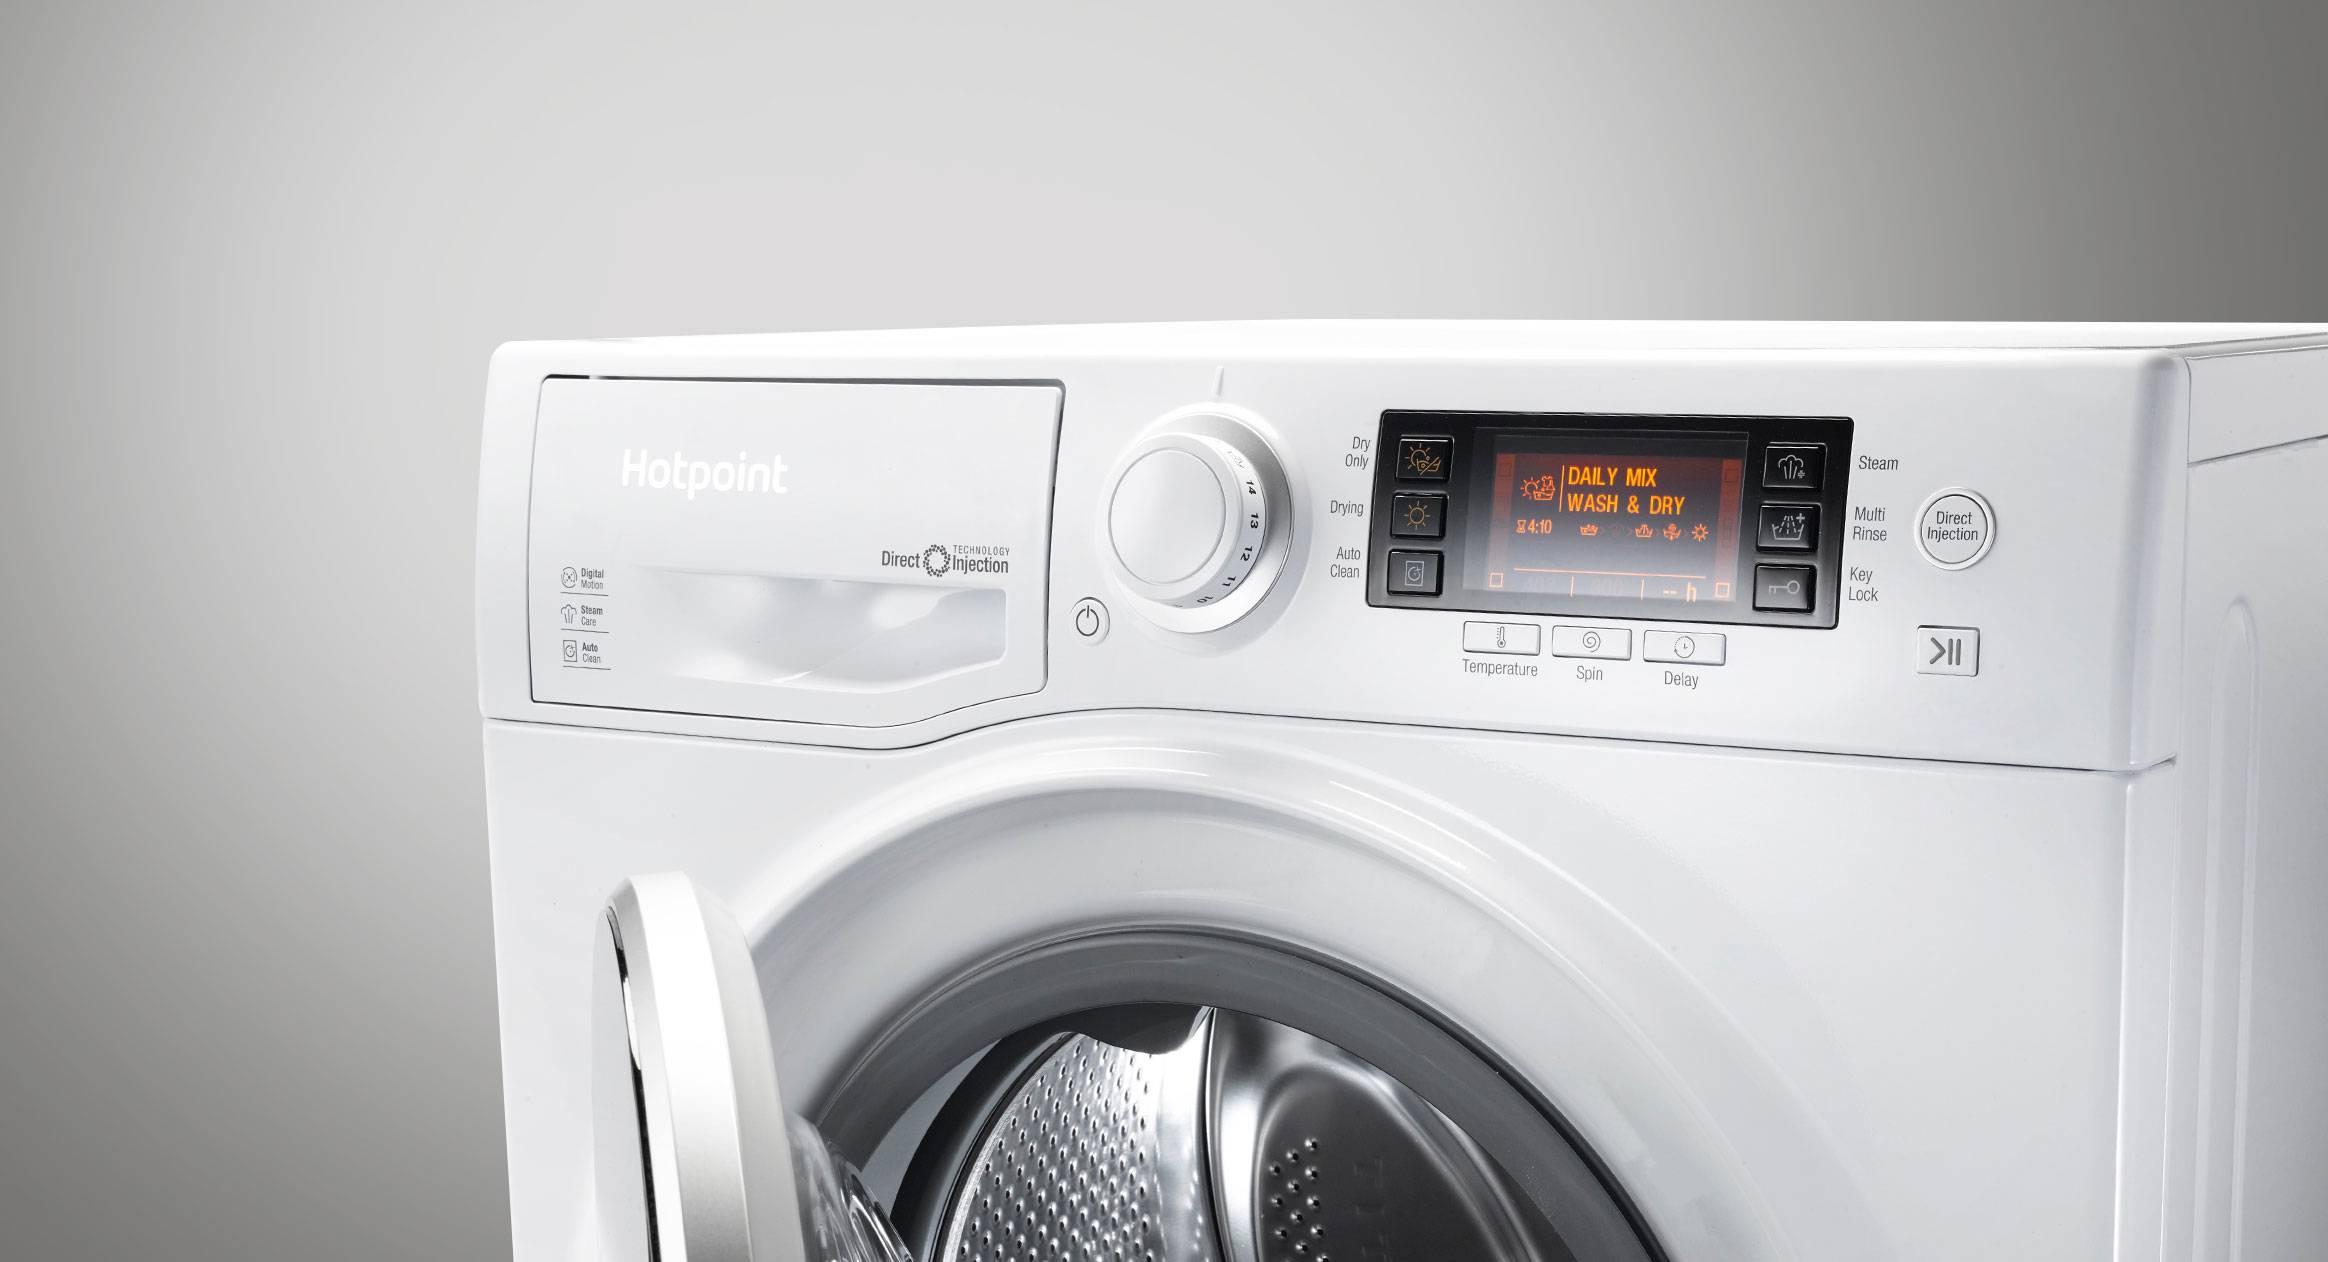 whirlpool washer dryer manual